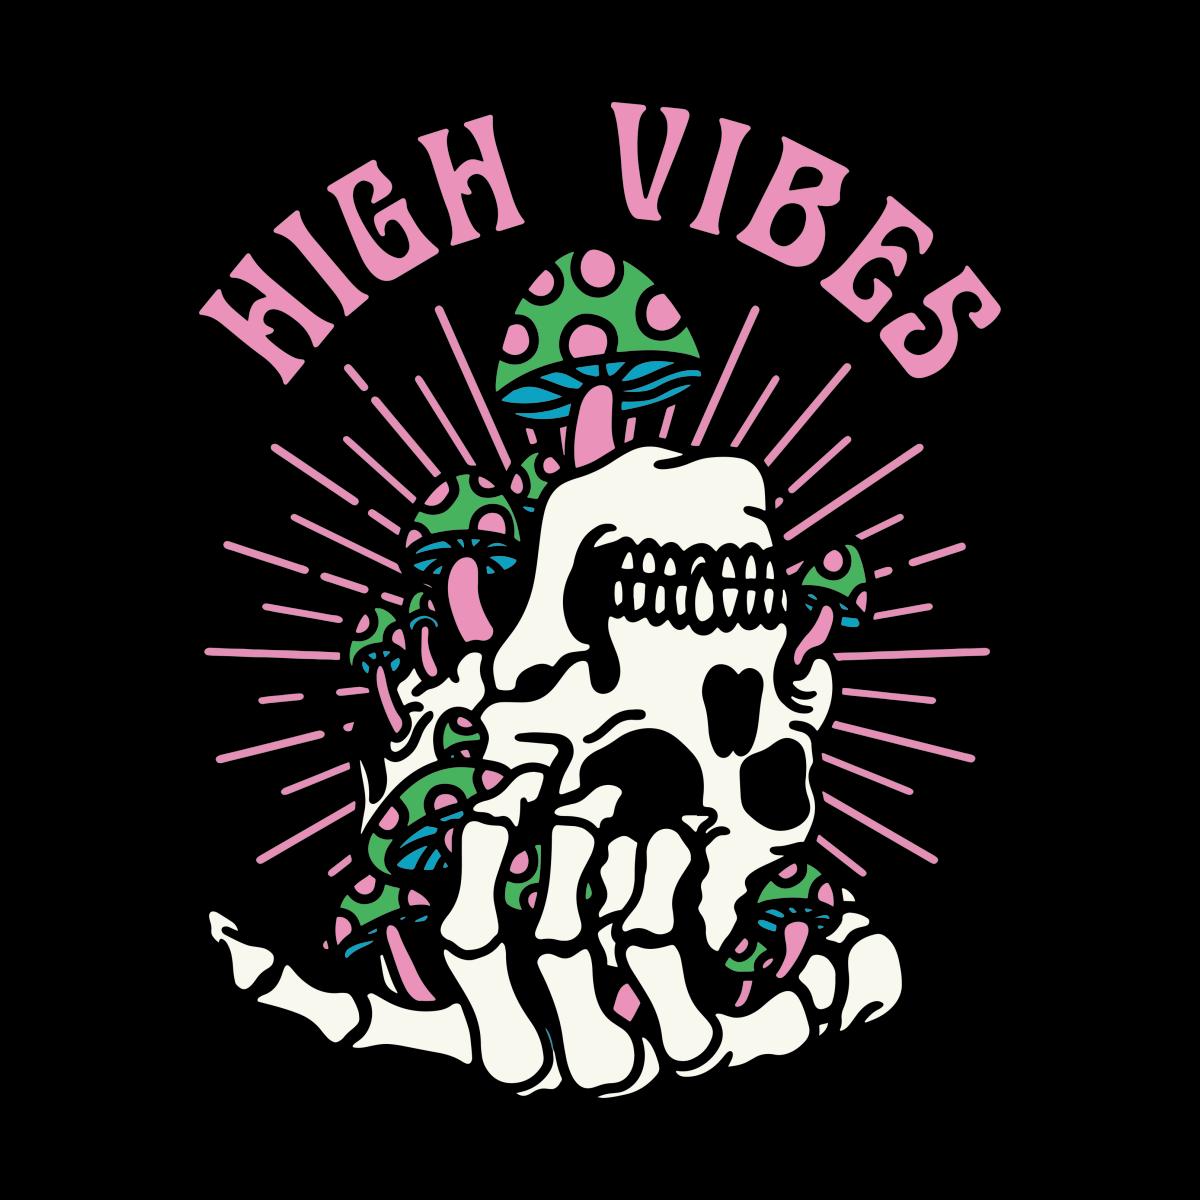 High VIbes | TerpeneTom's Artist Shop